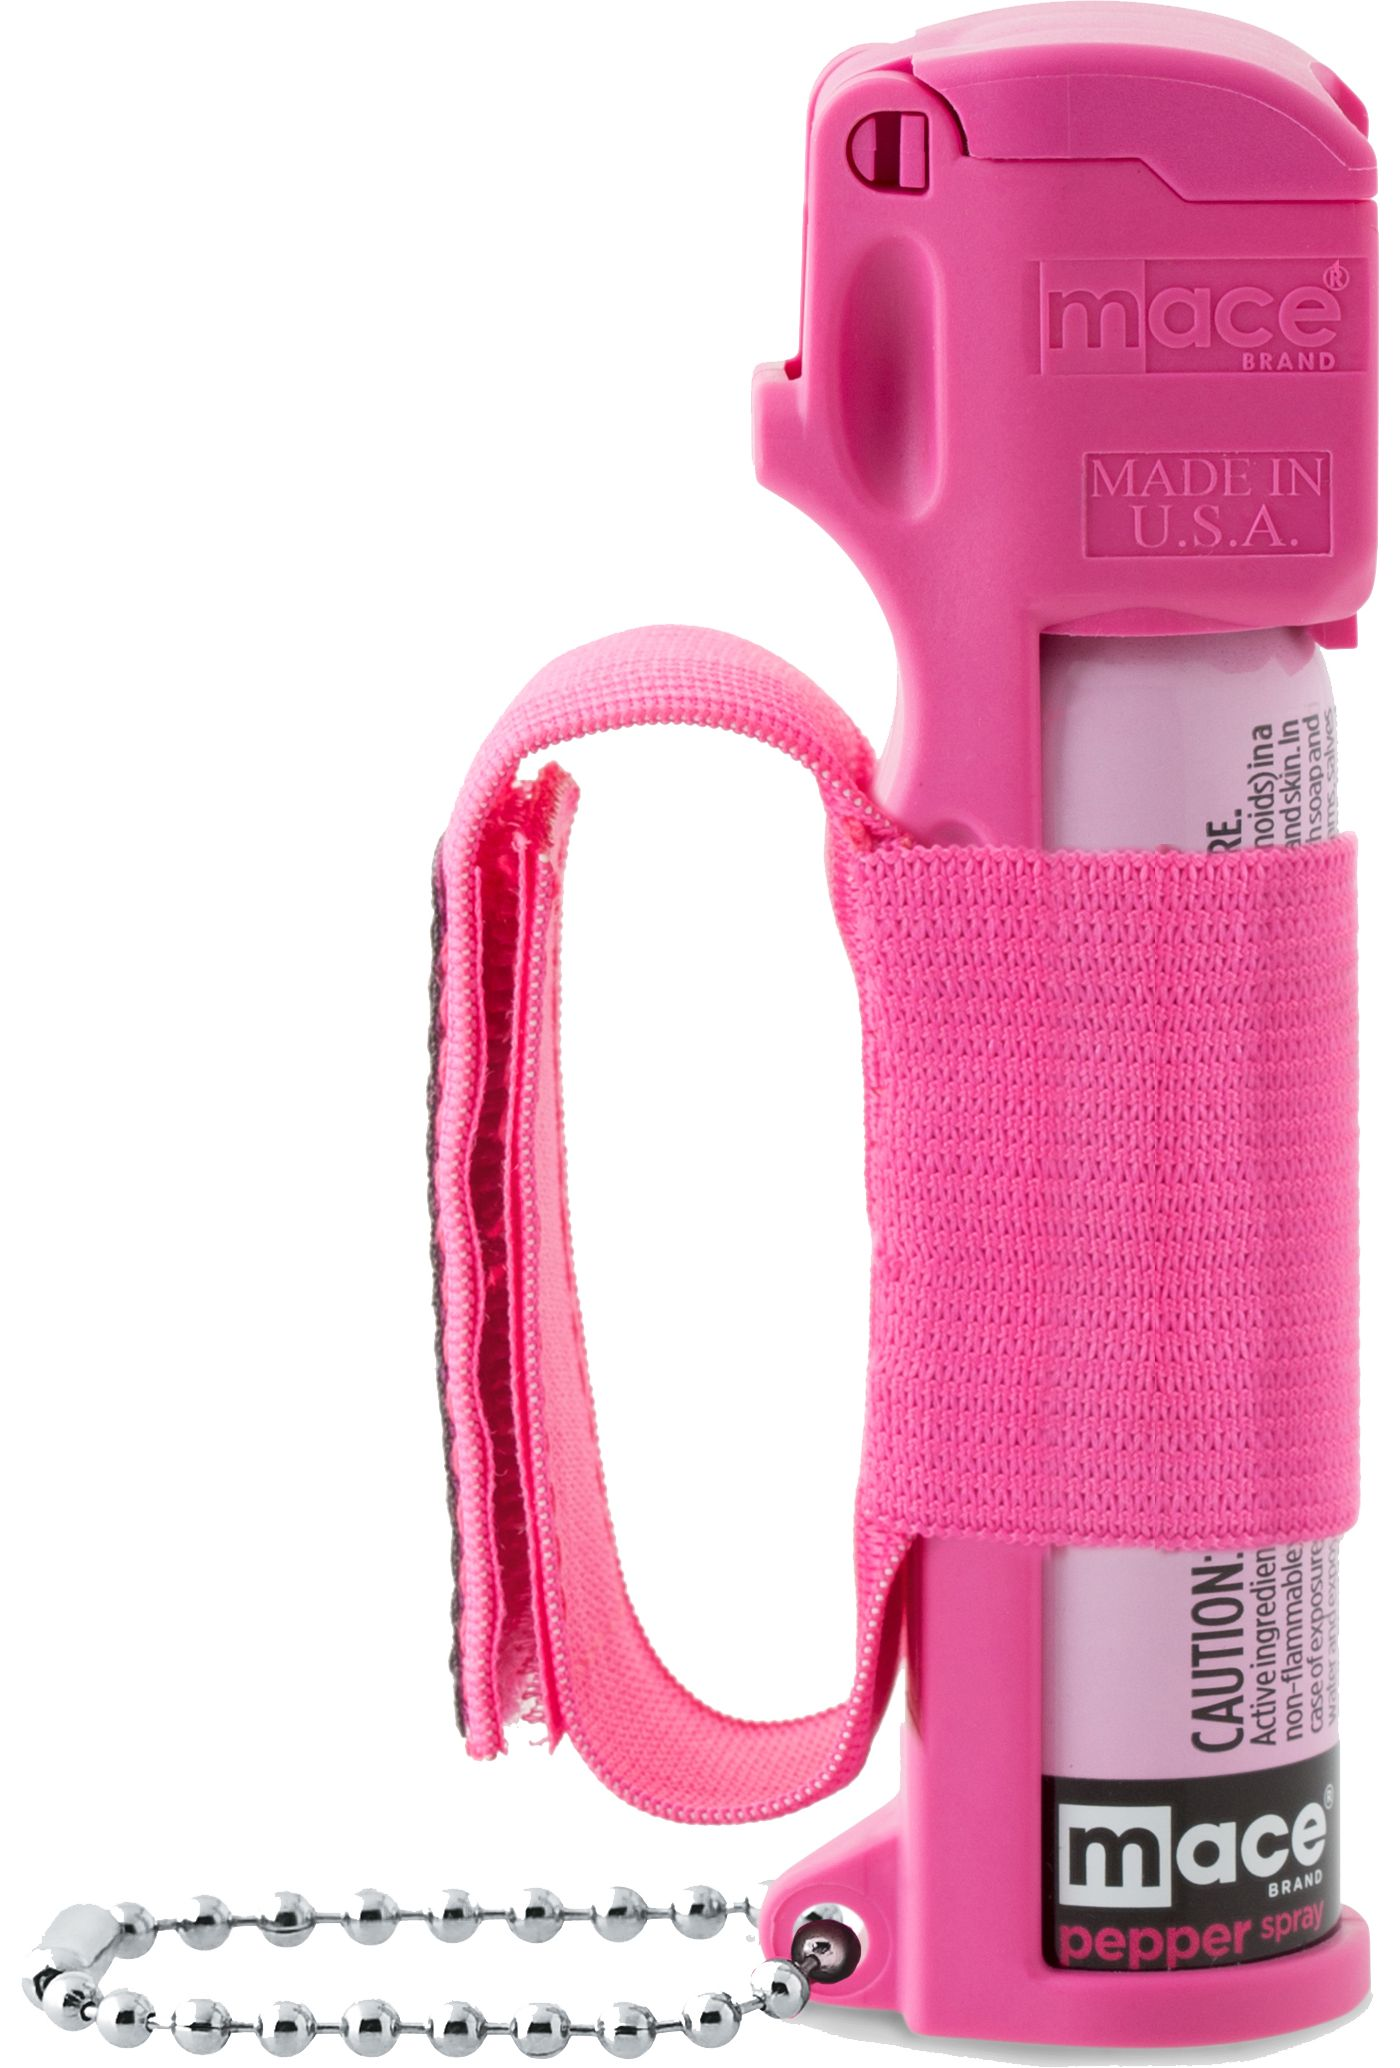 Mace Sport Jogger Pepper Spray